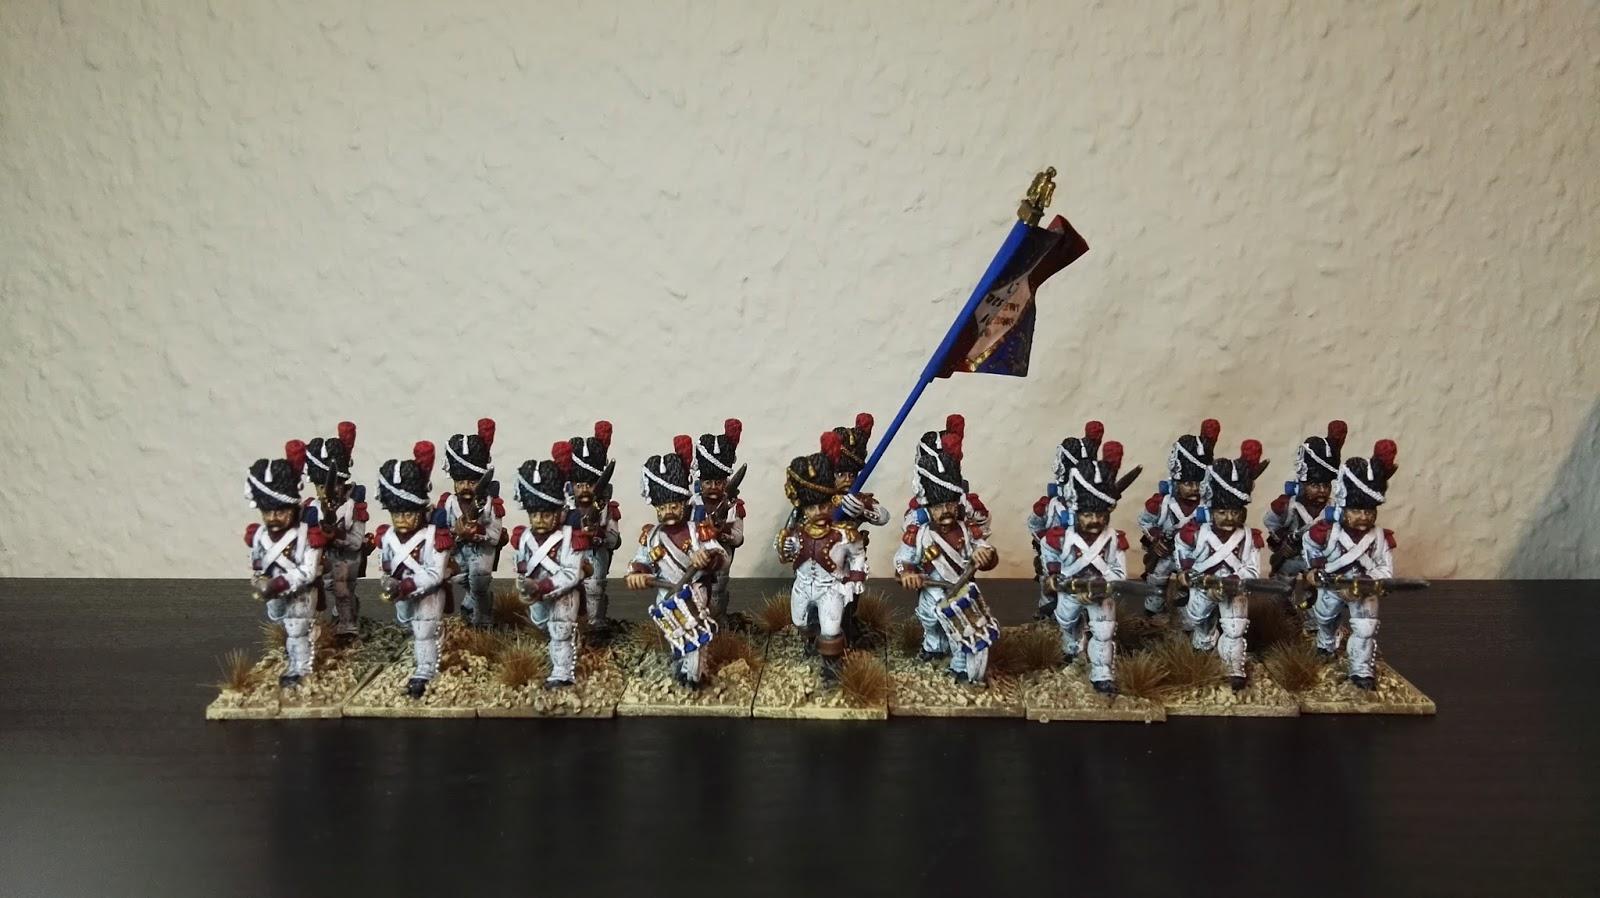 Grenadiers hollandais de la Garde impériale 3rd%2BDutch%2BGrenadier%2BRegiment%2B%25281%2529